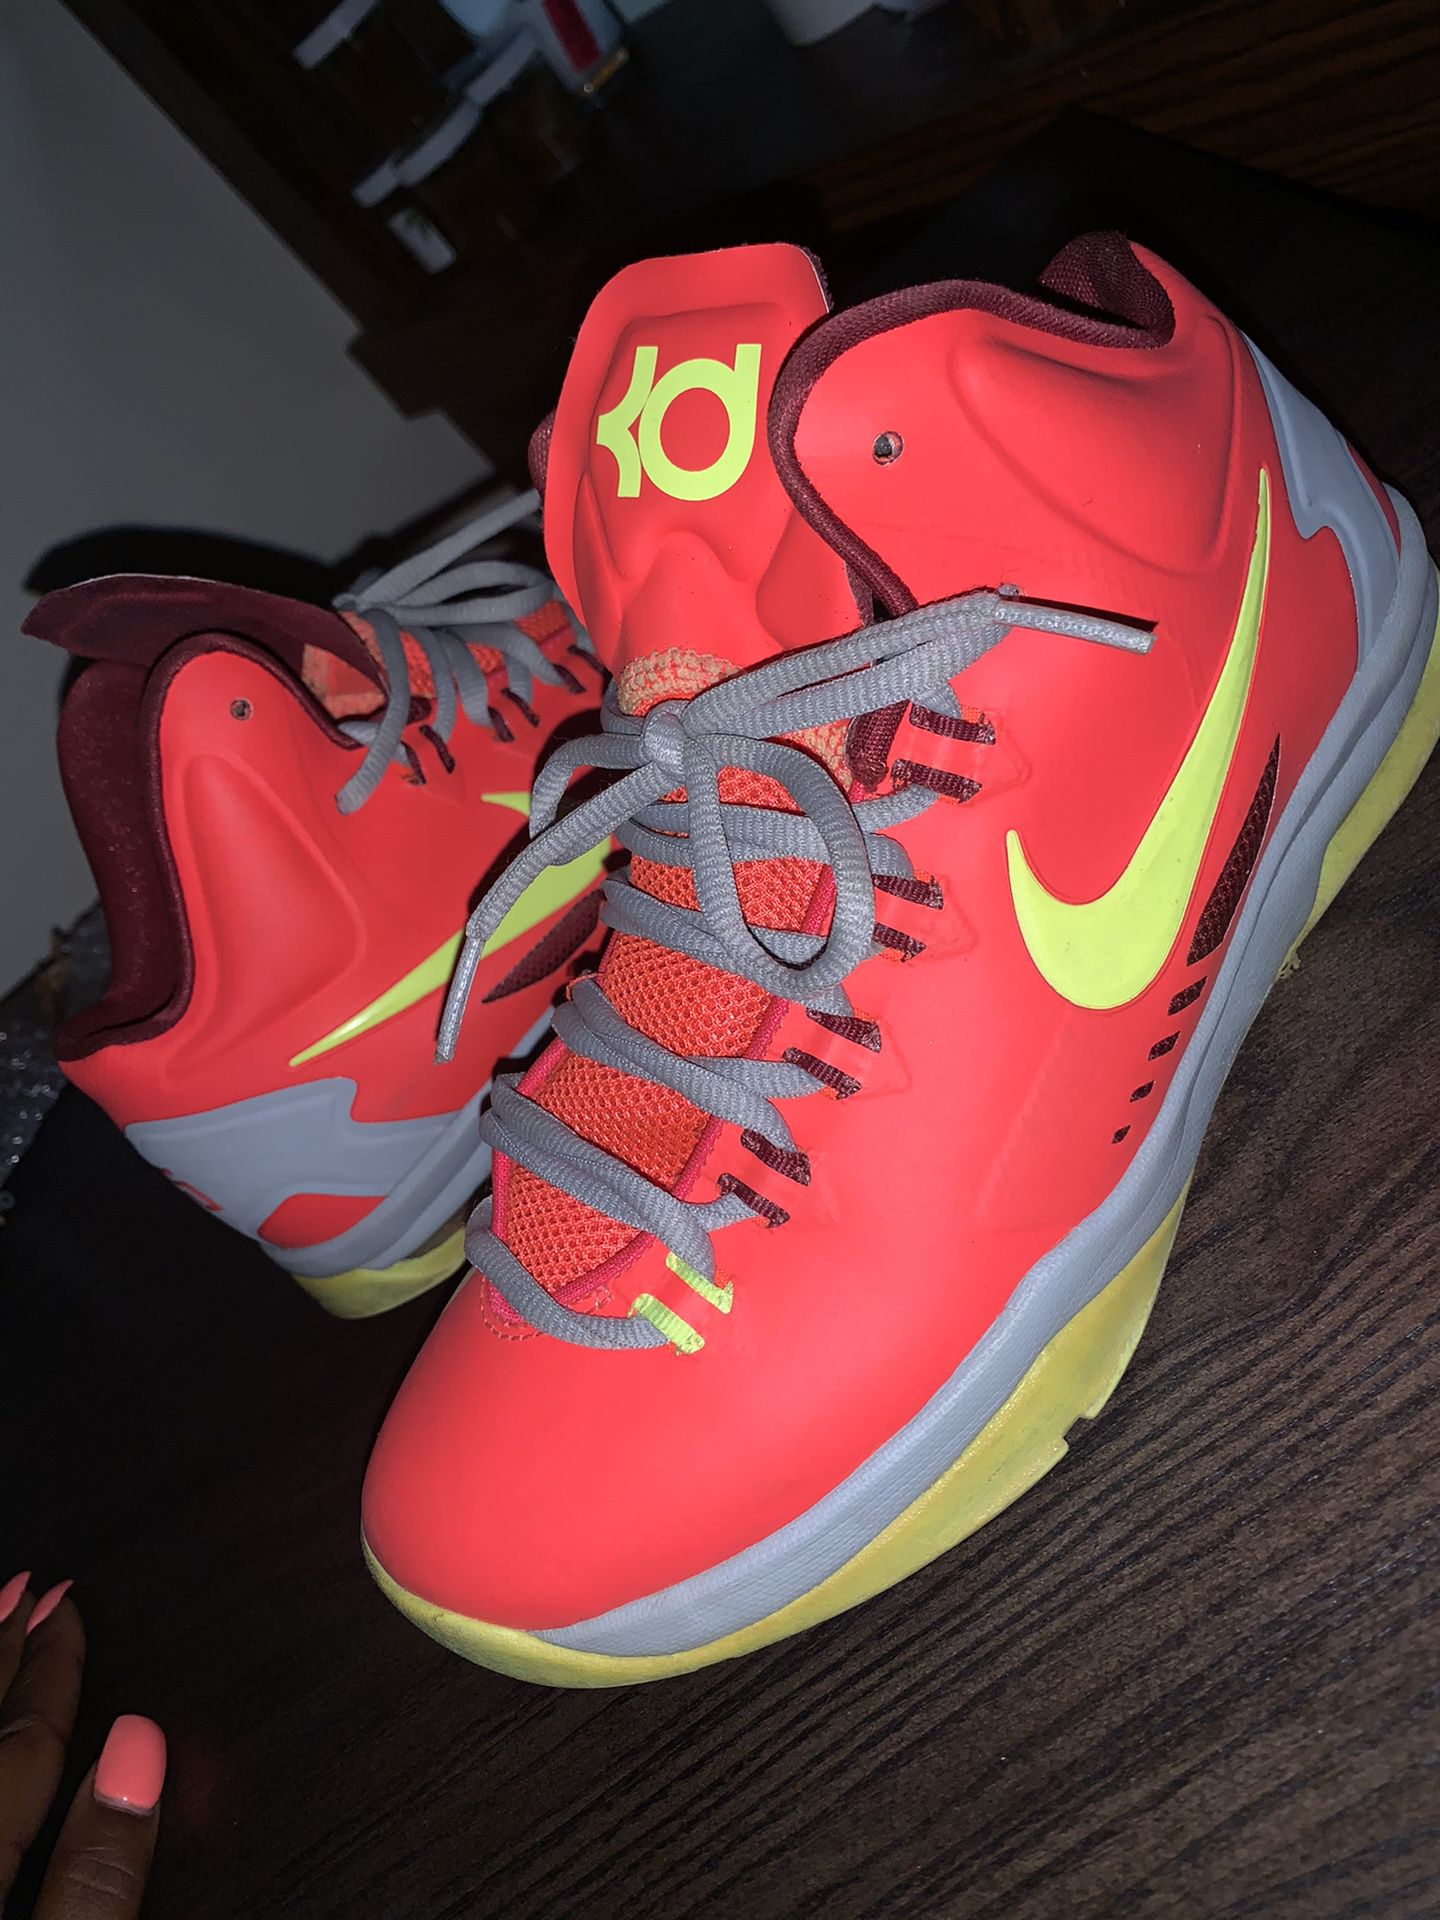 KD's Sneakers